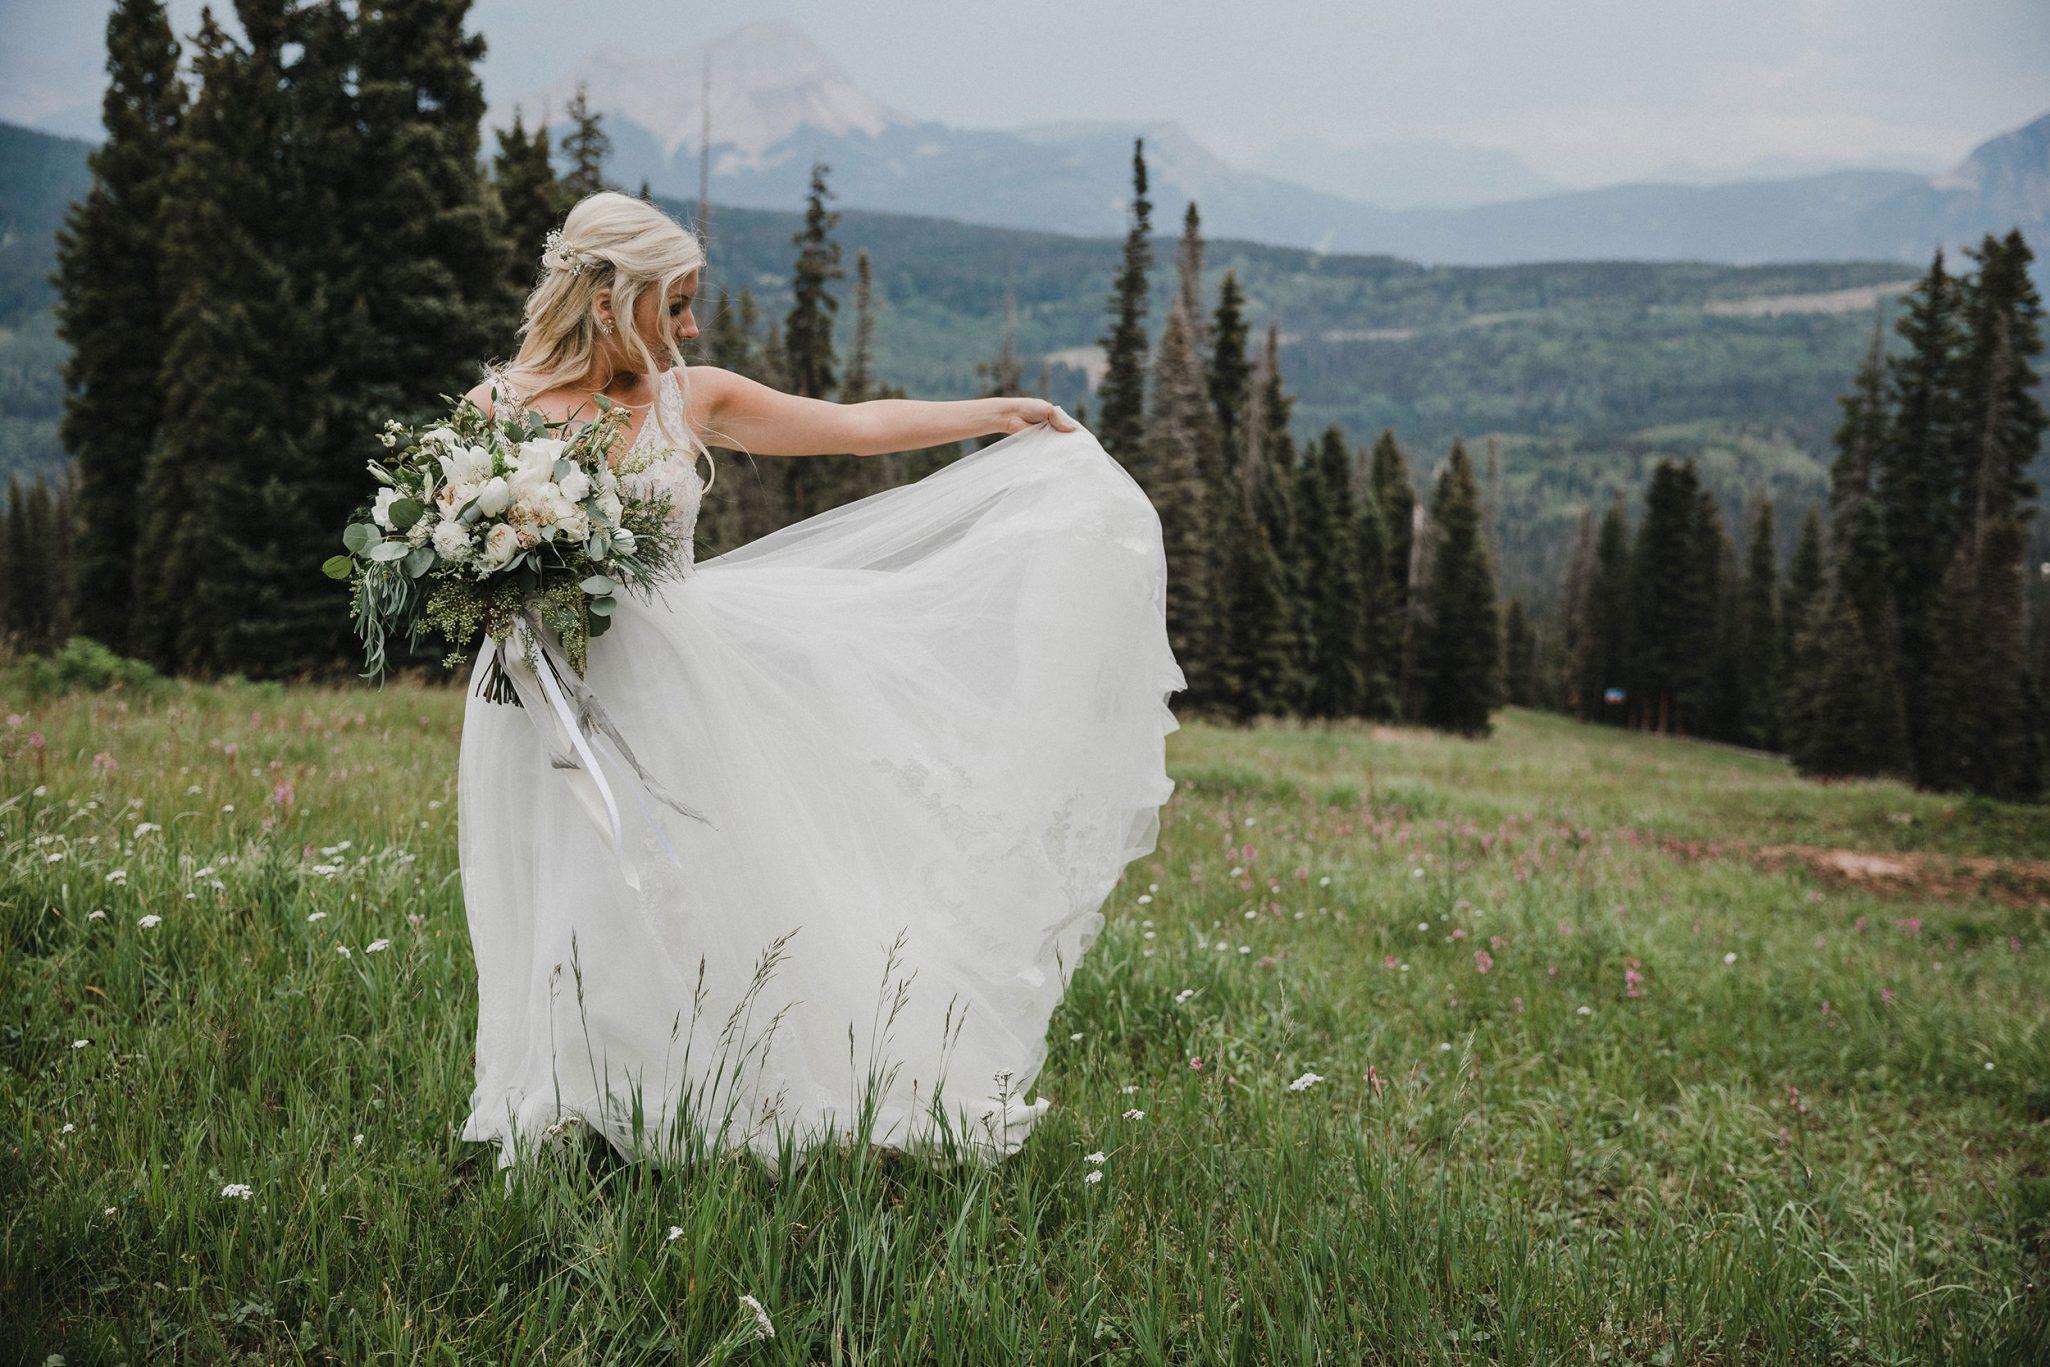 A Perfectly Simplistic Mountain Wedding at Purgatory Resort, Durango Colorado